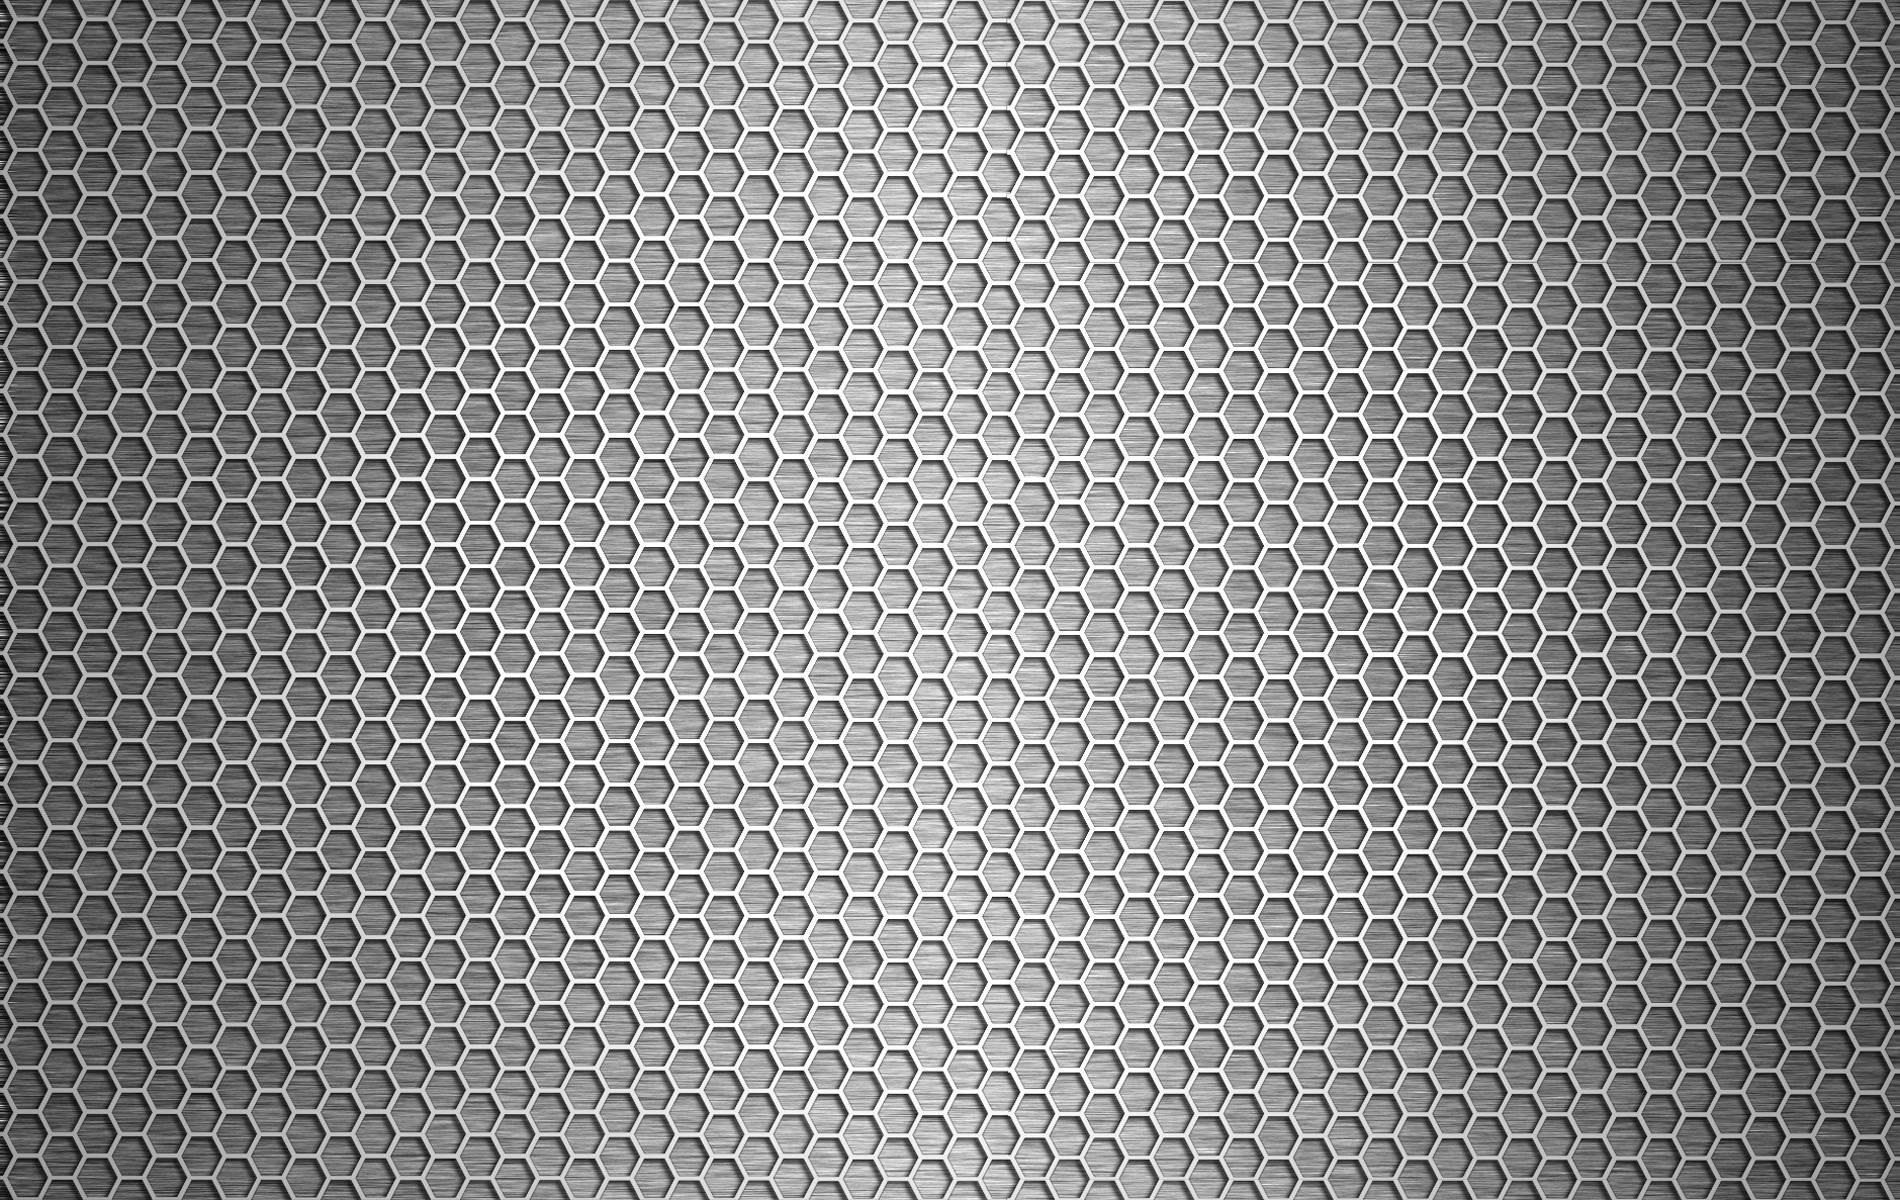 Free Metal Wallpapers